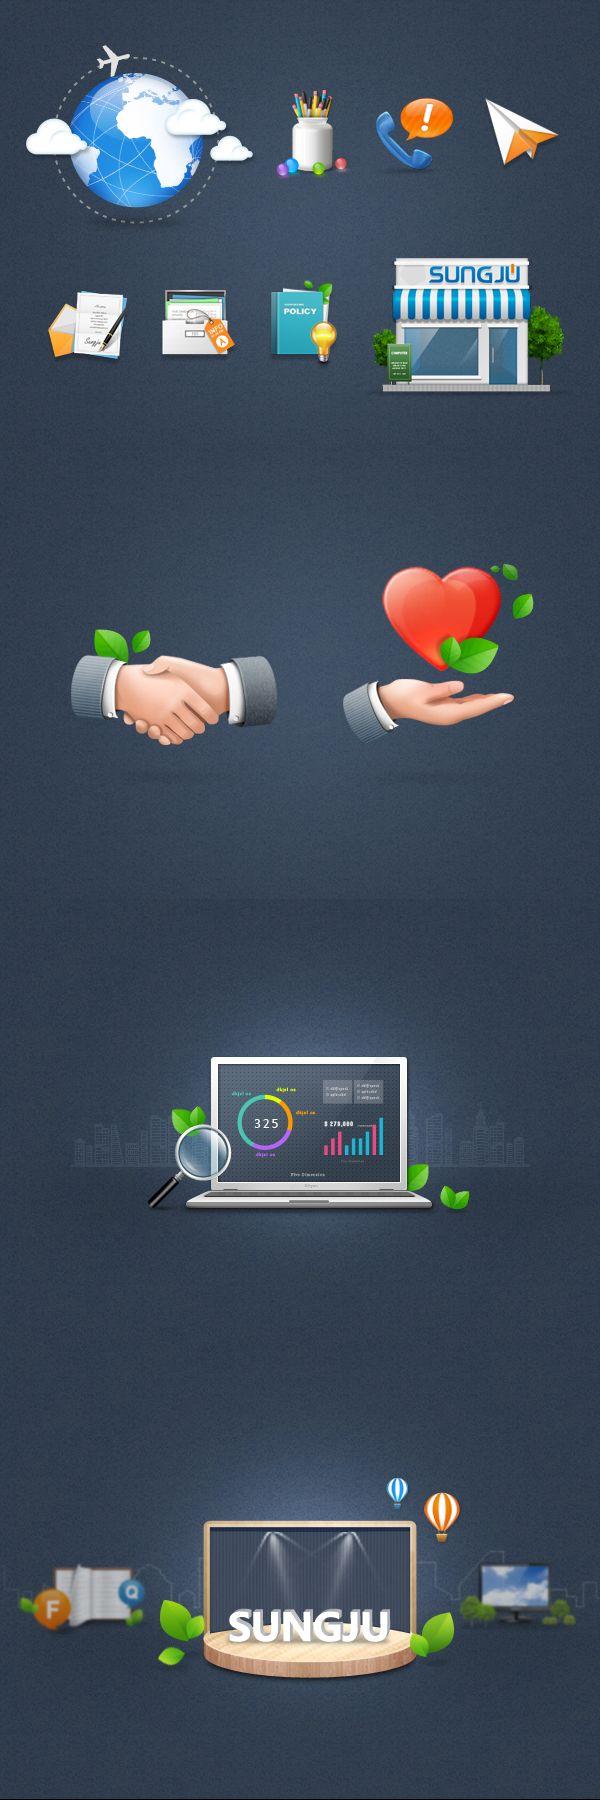 Business Website Icon - Sungju comtech / JC hyun